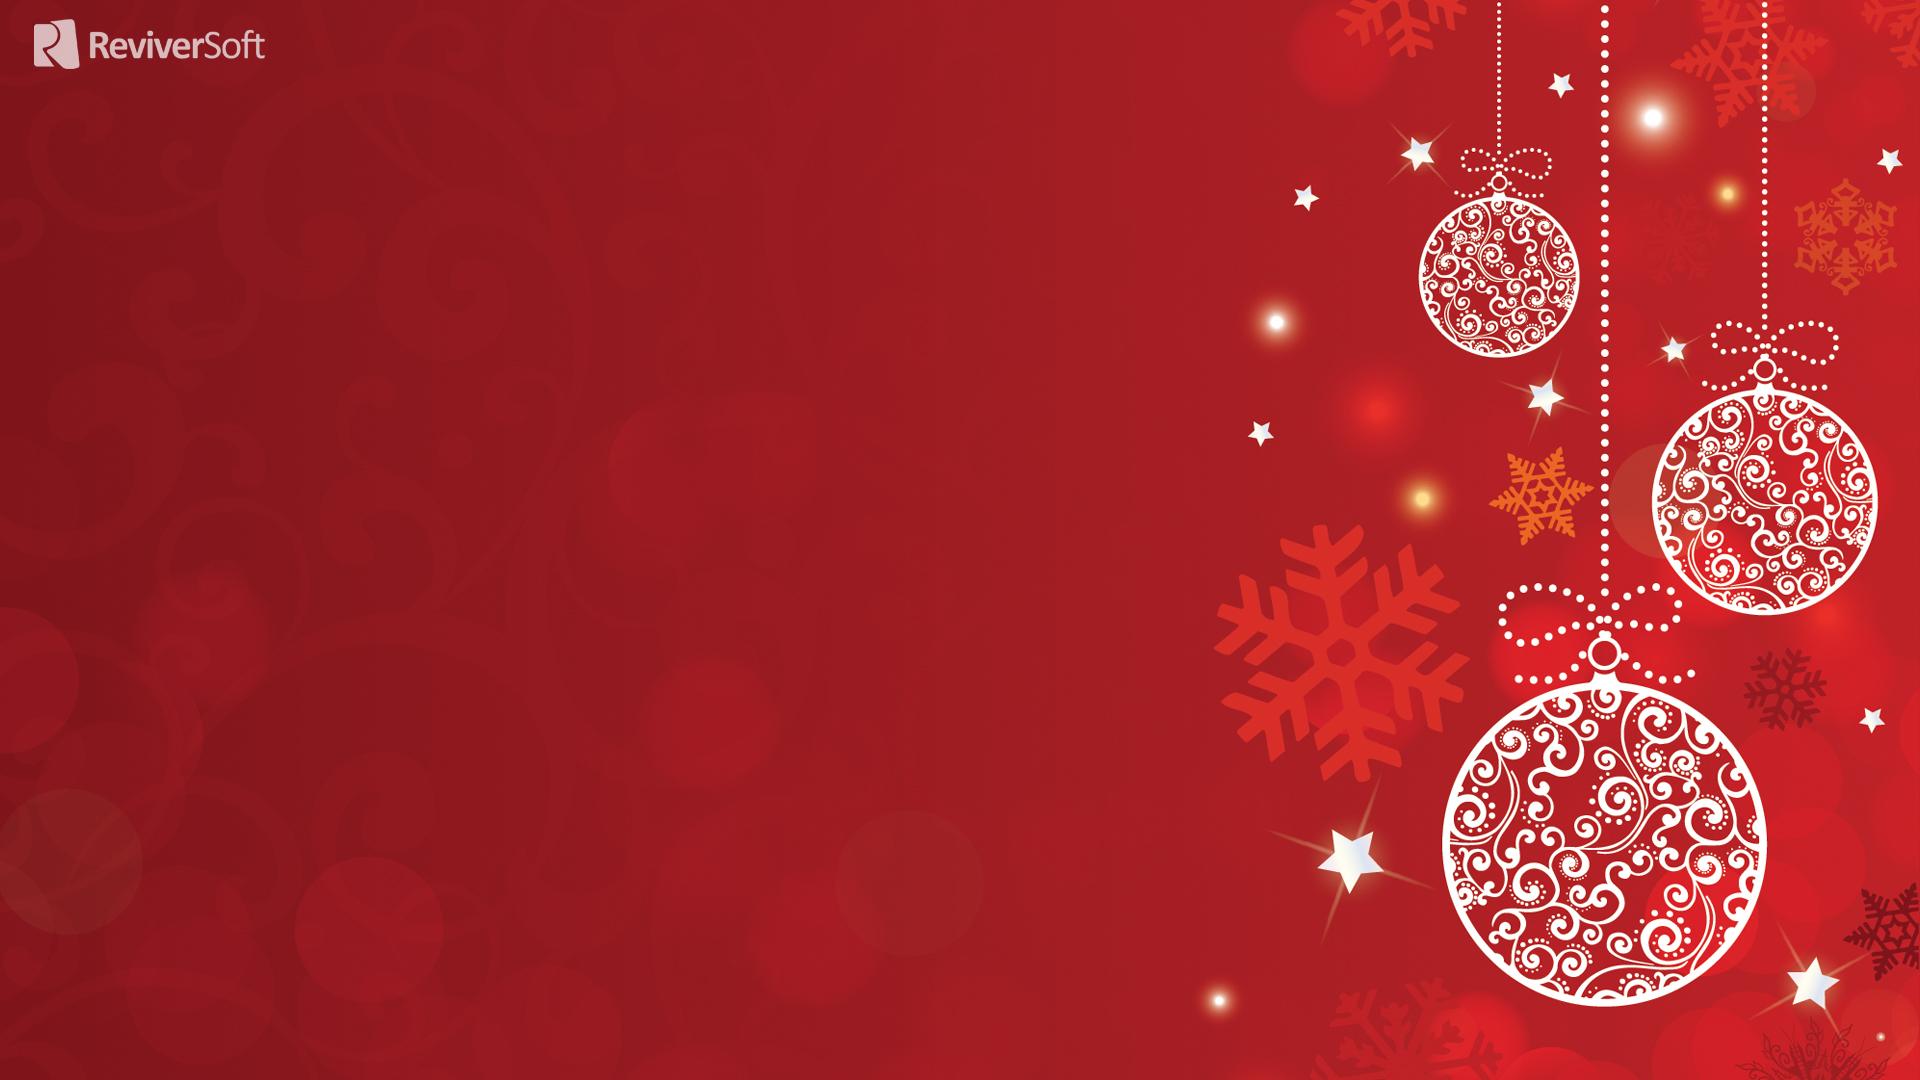 74+ Red Christmas Wallpaper on WallpaperSafari